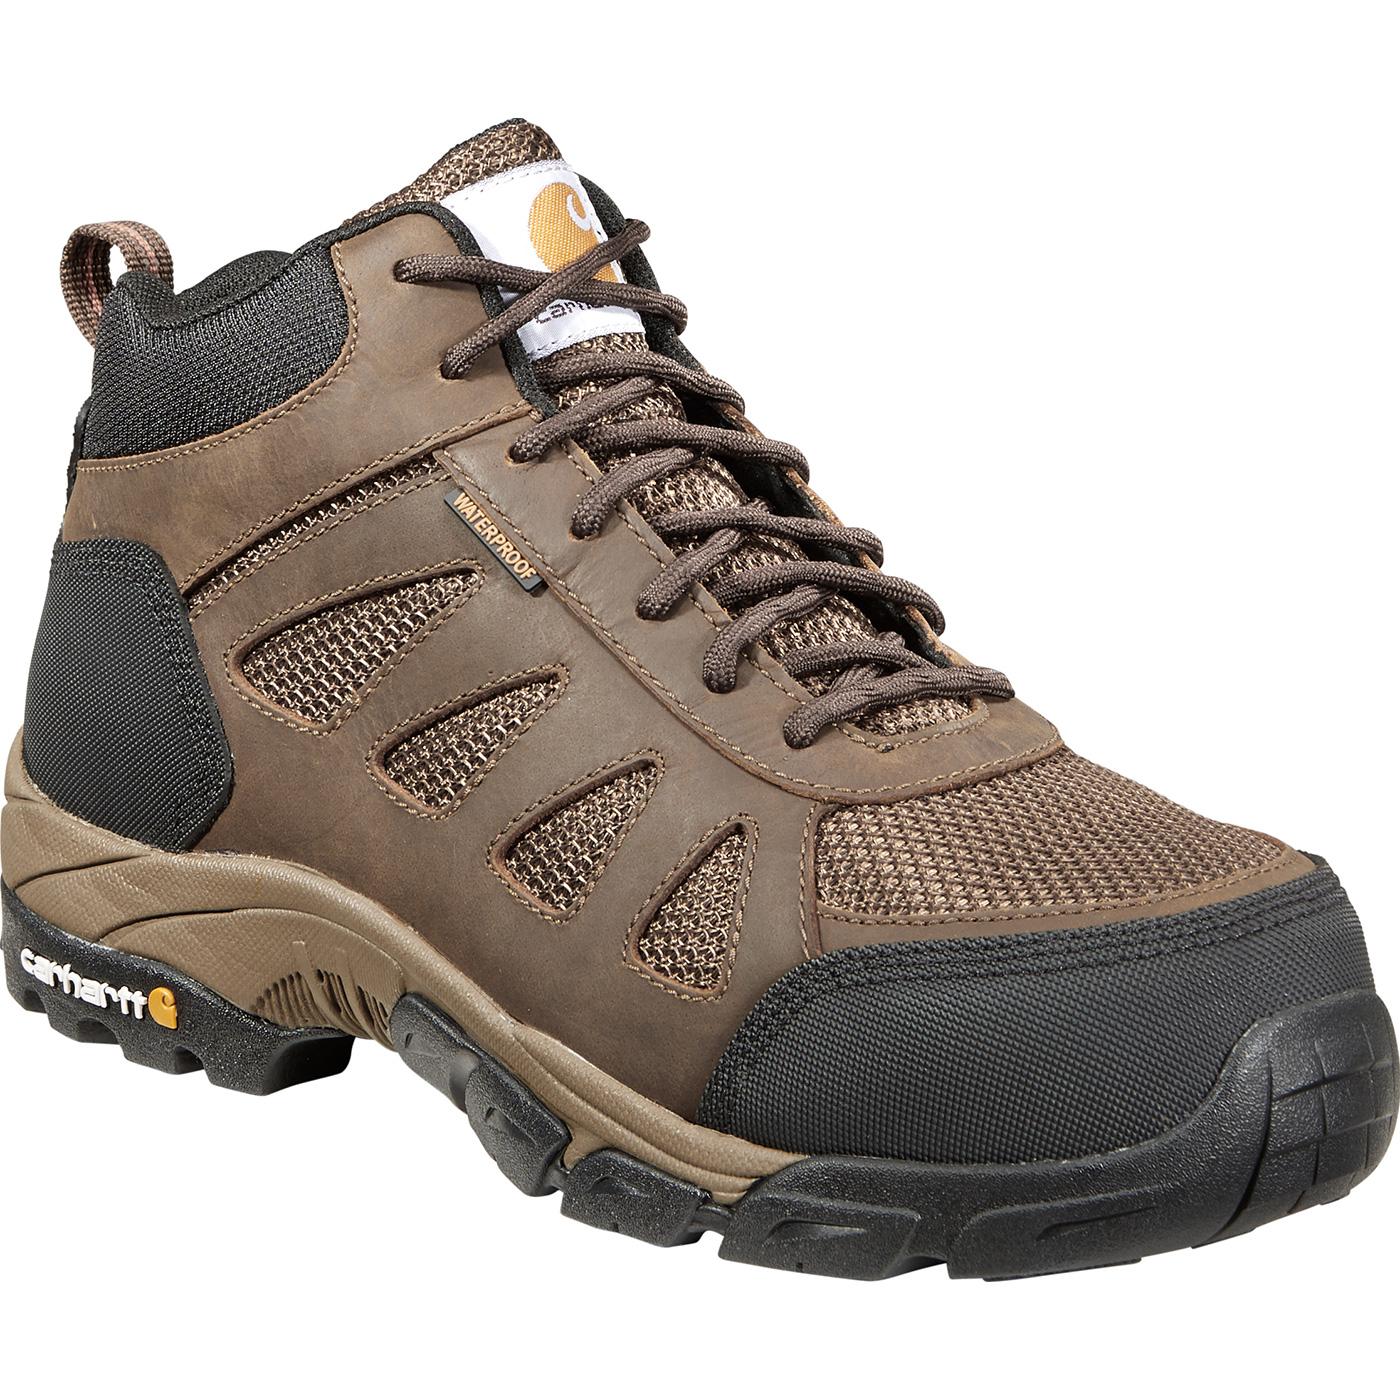 d69810ae1de Carhartt Lightweight Men's 4 inch Carbon Nano Toe Electrical Hazard  Waterproof Work Hiker